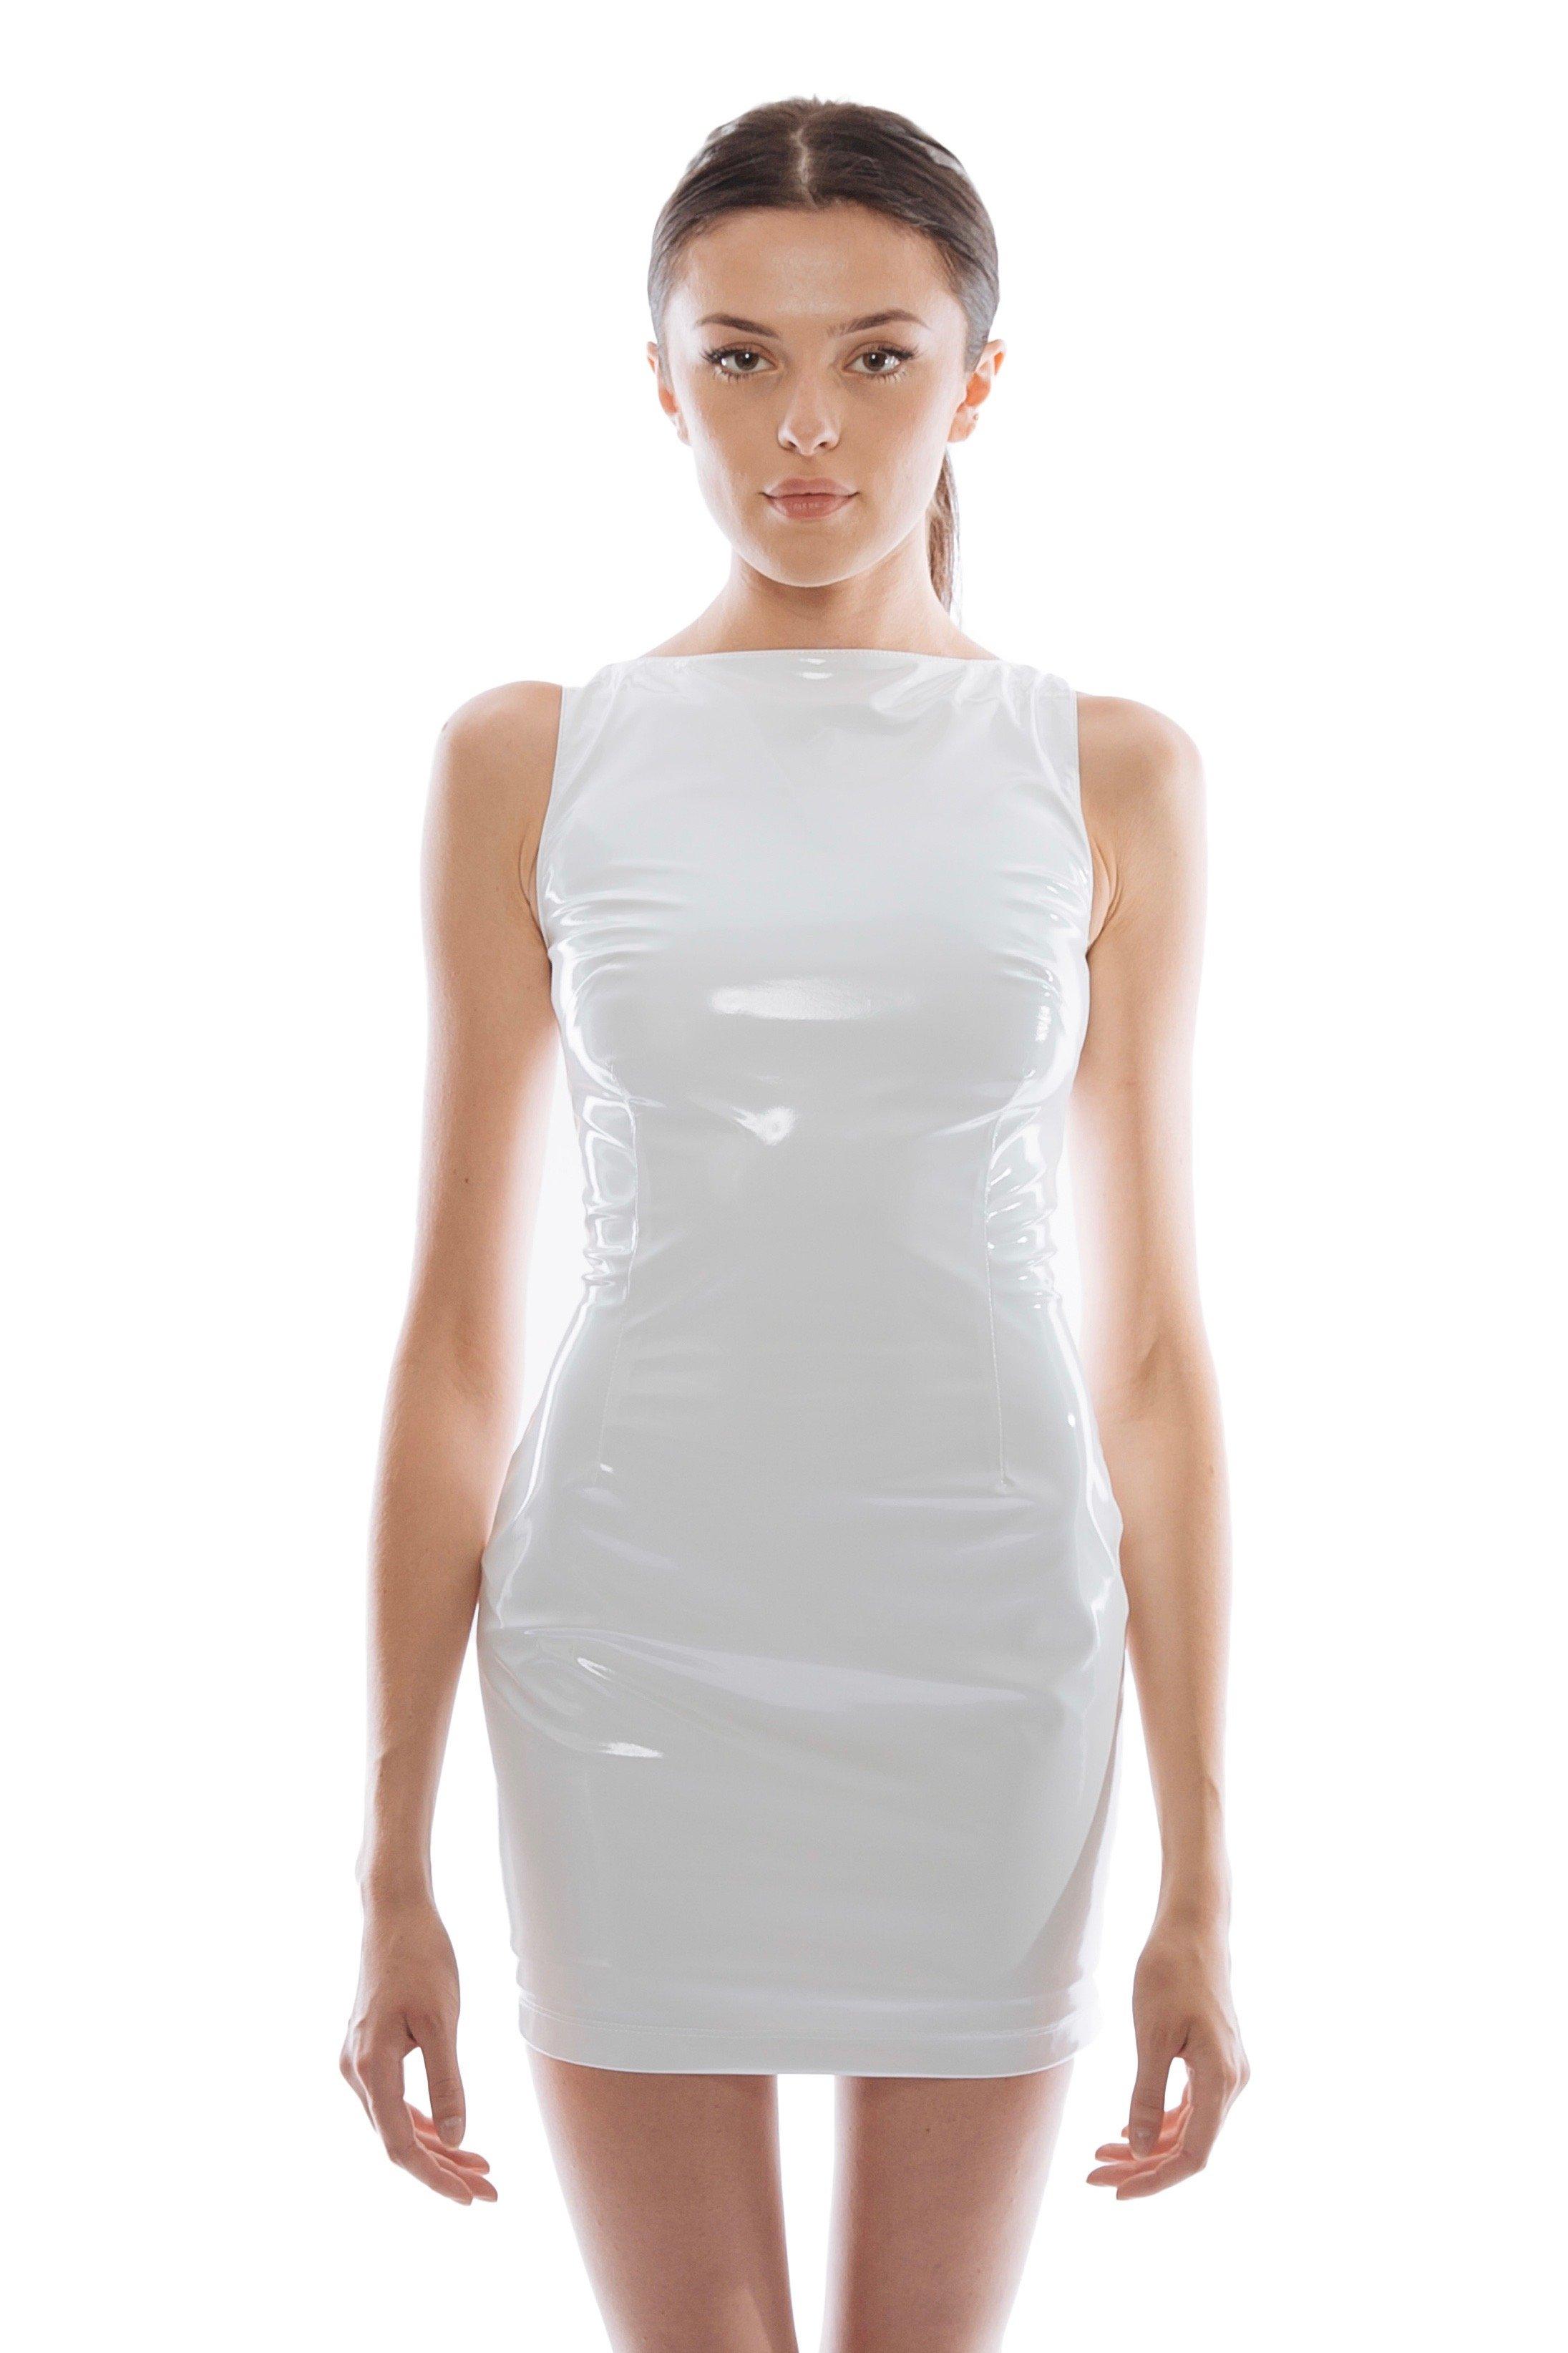 PATENT MINI DRESS - White